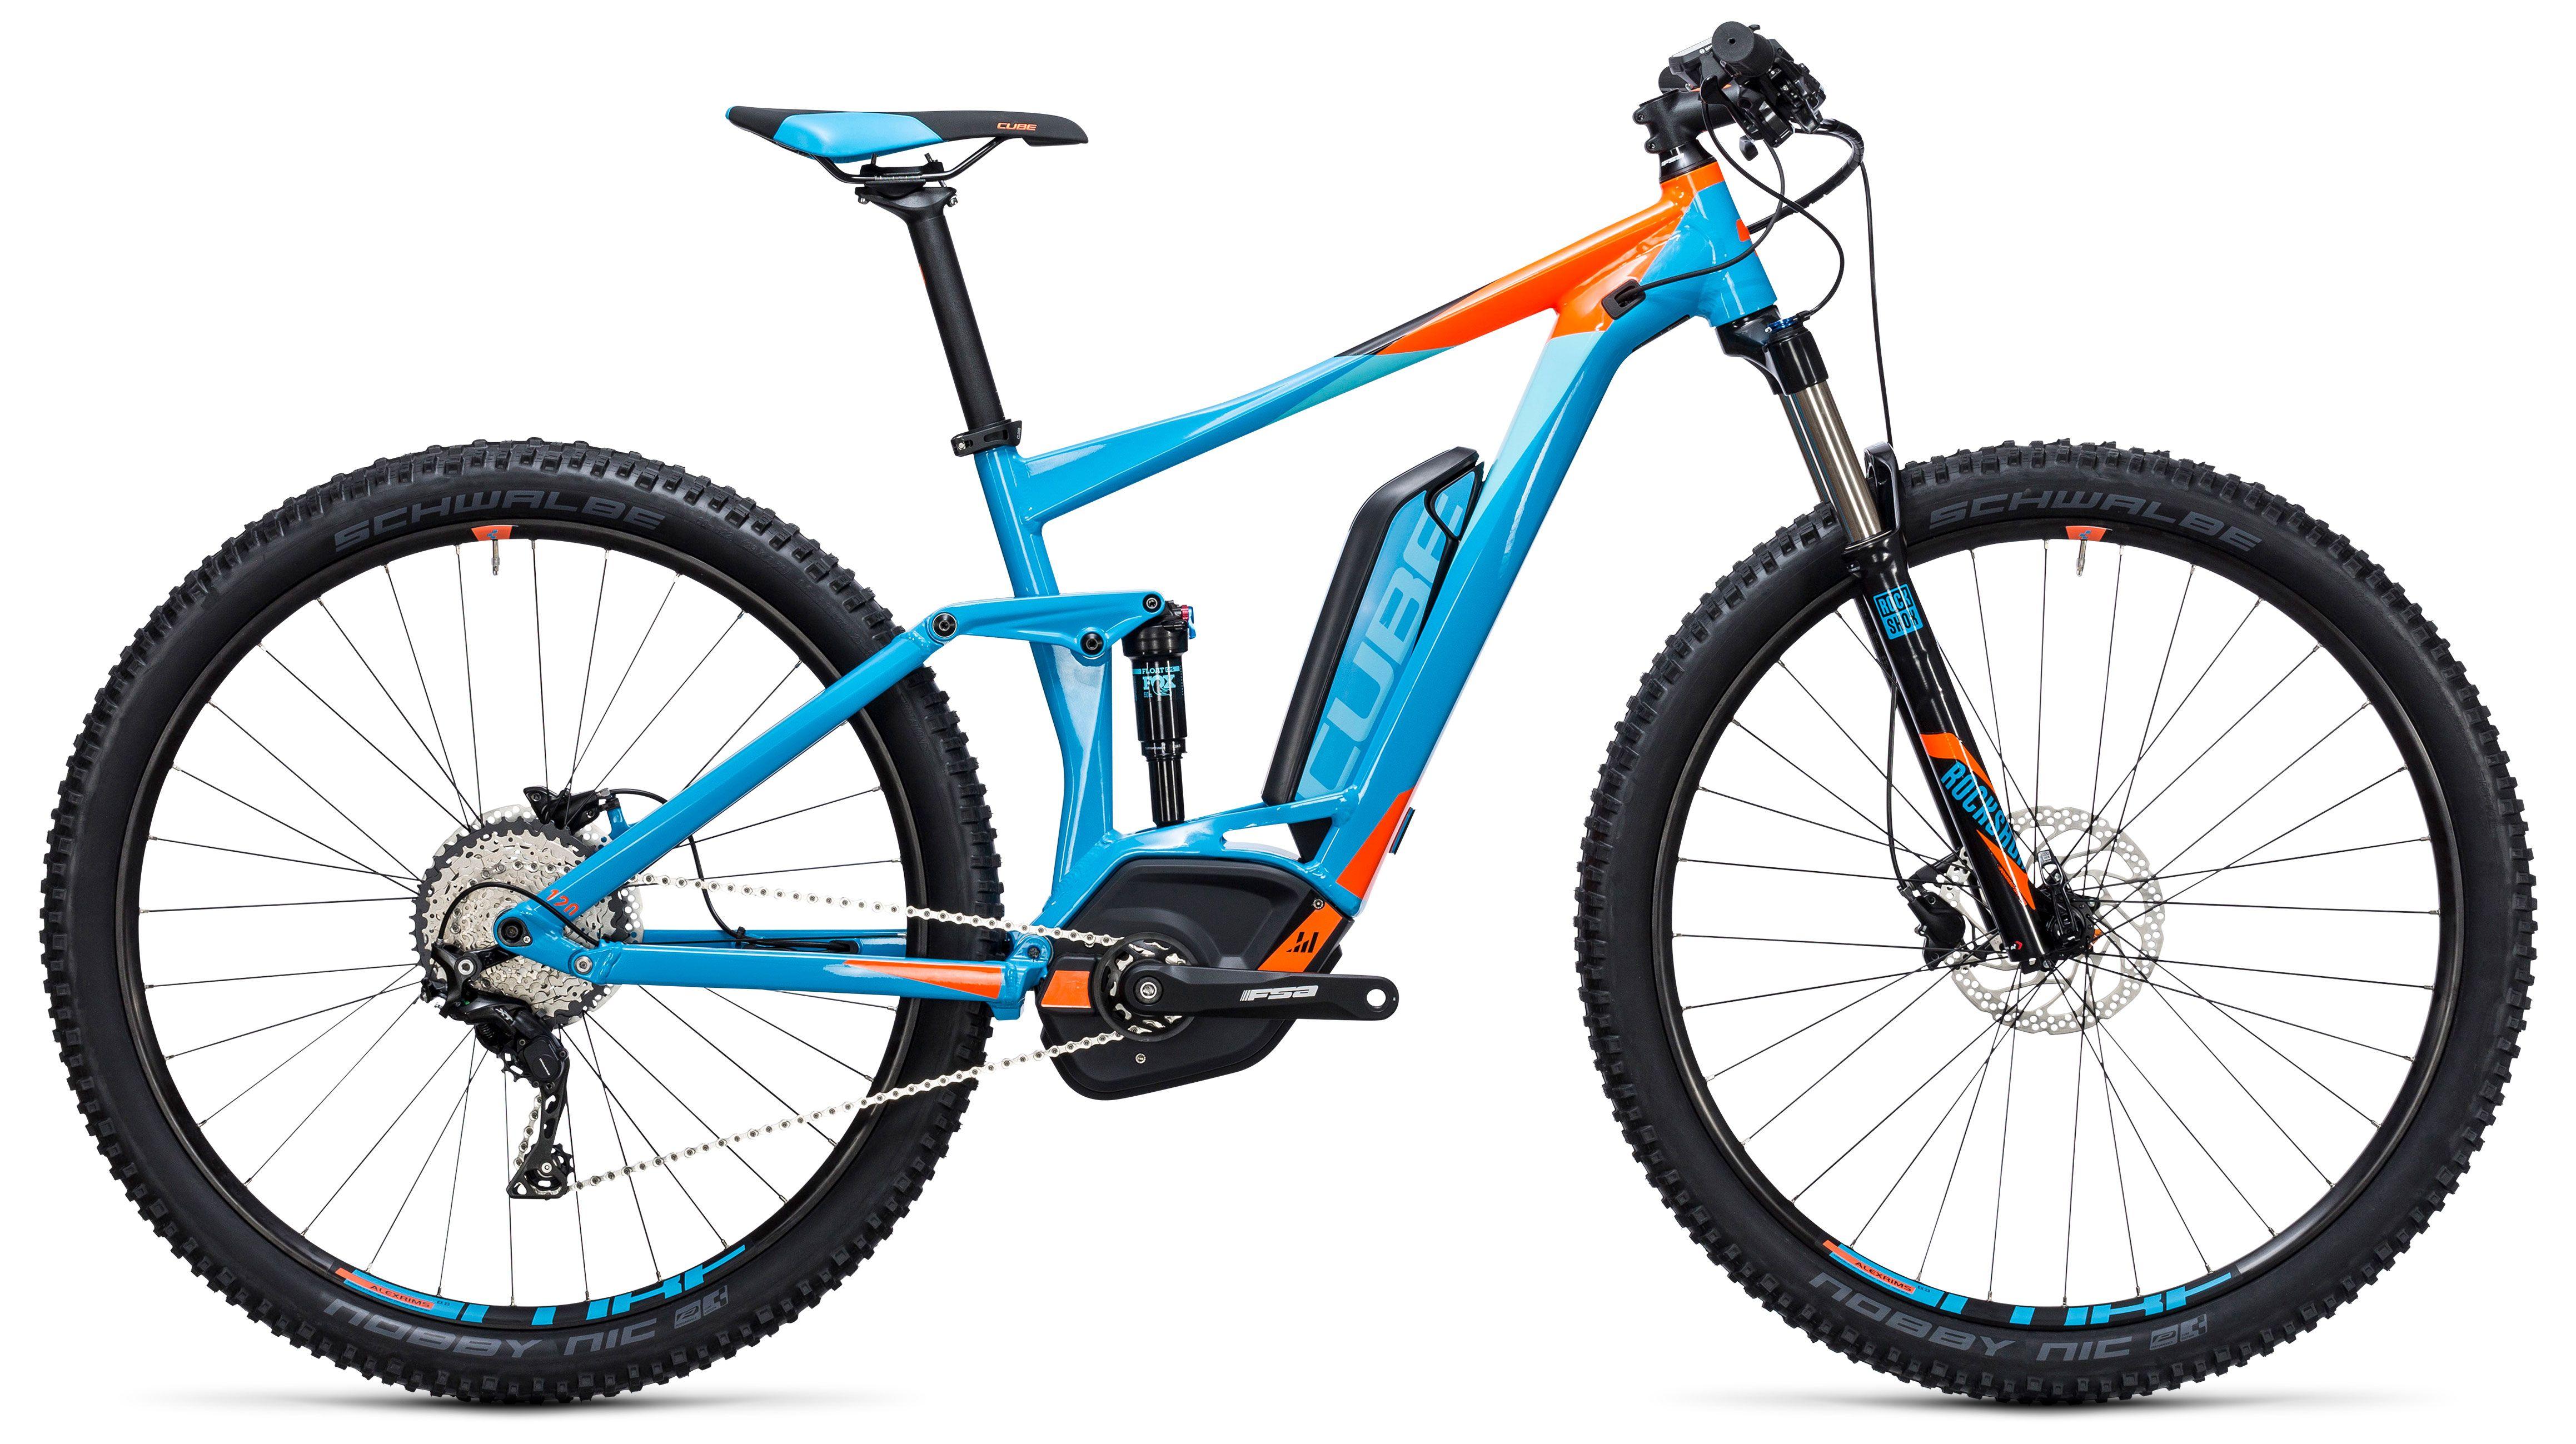 Велосипед Cube Stereo Hybrid 120 HPA PRO 500 27.5 2017,  Двухподвесы  - артикул:272820